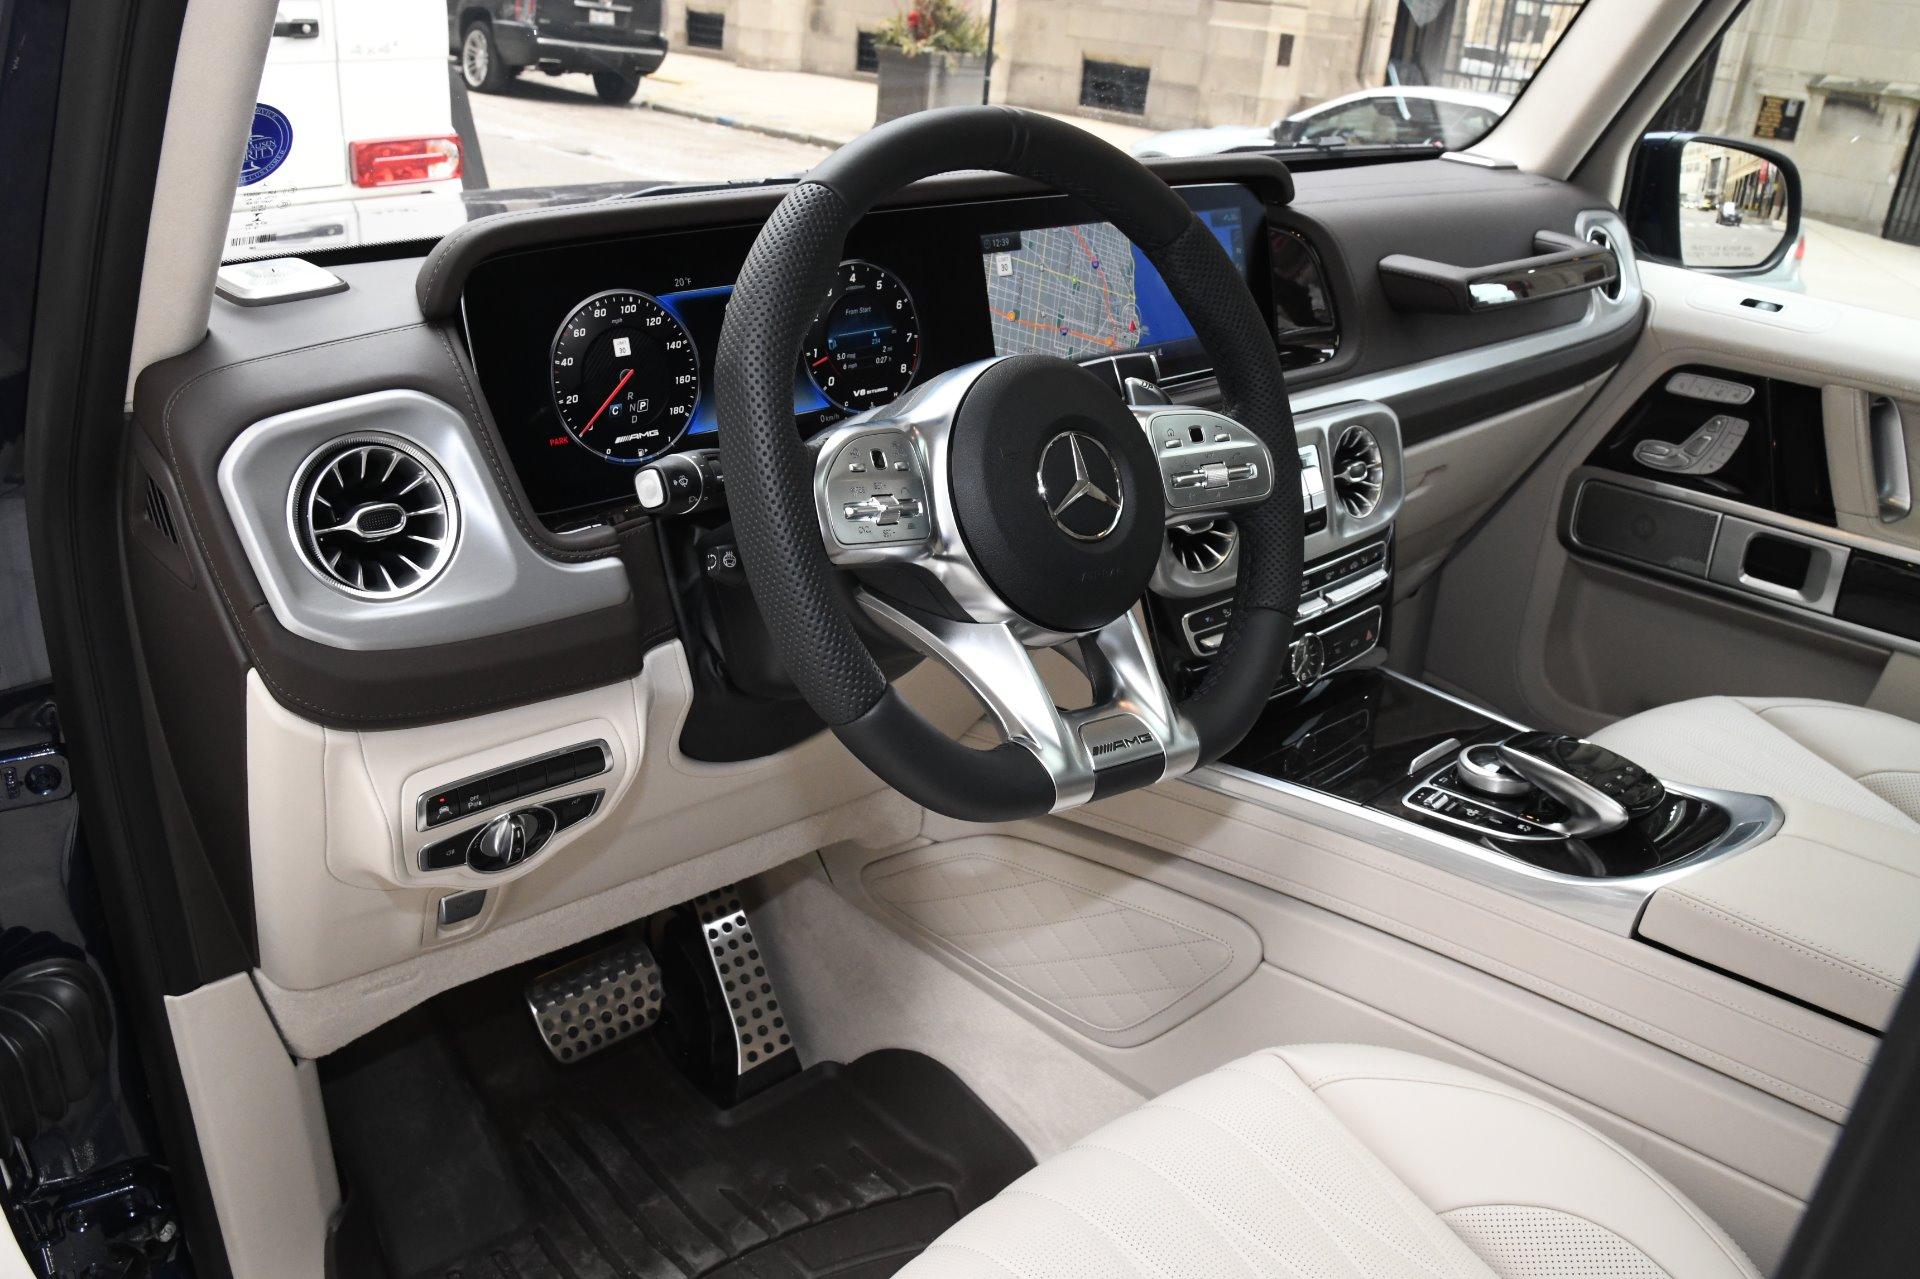 2019 Mercedes Benz G Class Amg G 63 Stock 12489 For Sale Near Chicago Il Il Mercedes Benz Dealer